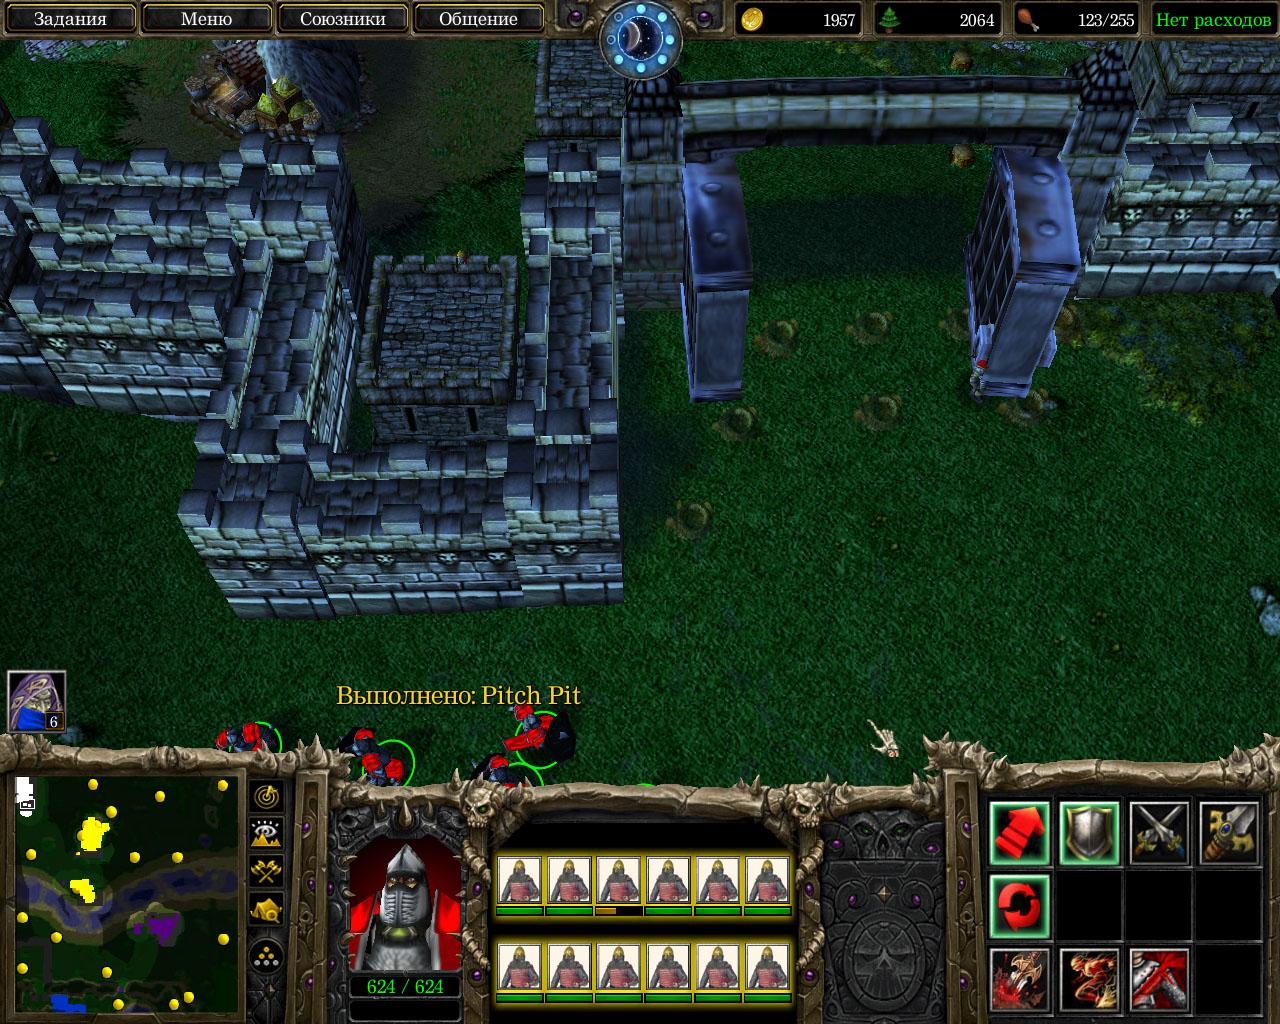 Warcraft 3 frozen throne legion td mega 34 goblin tactitcs/strategy